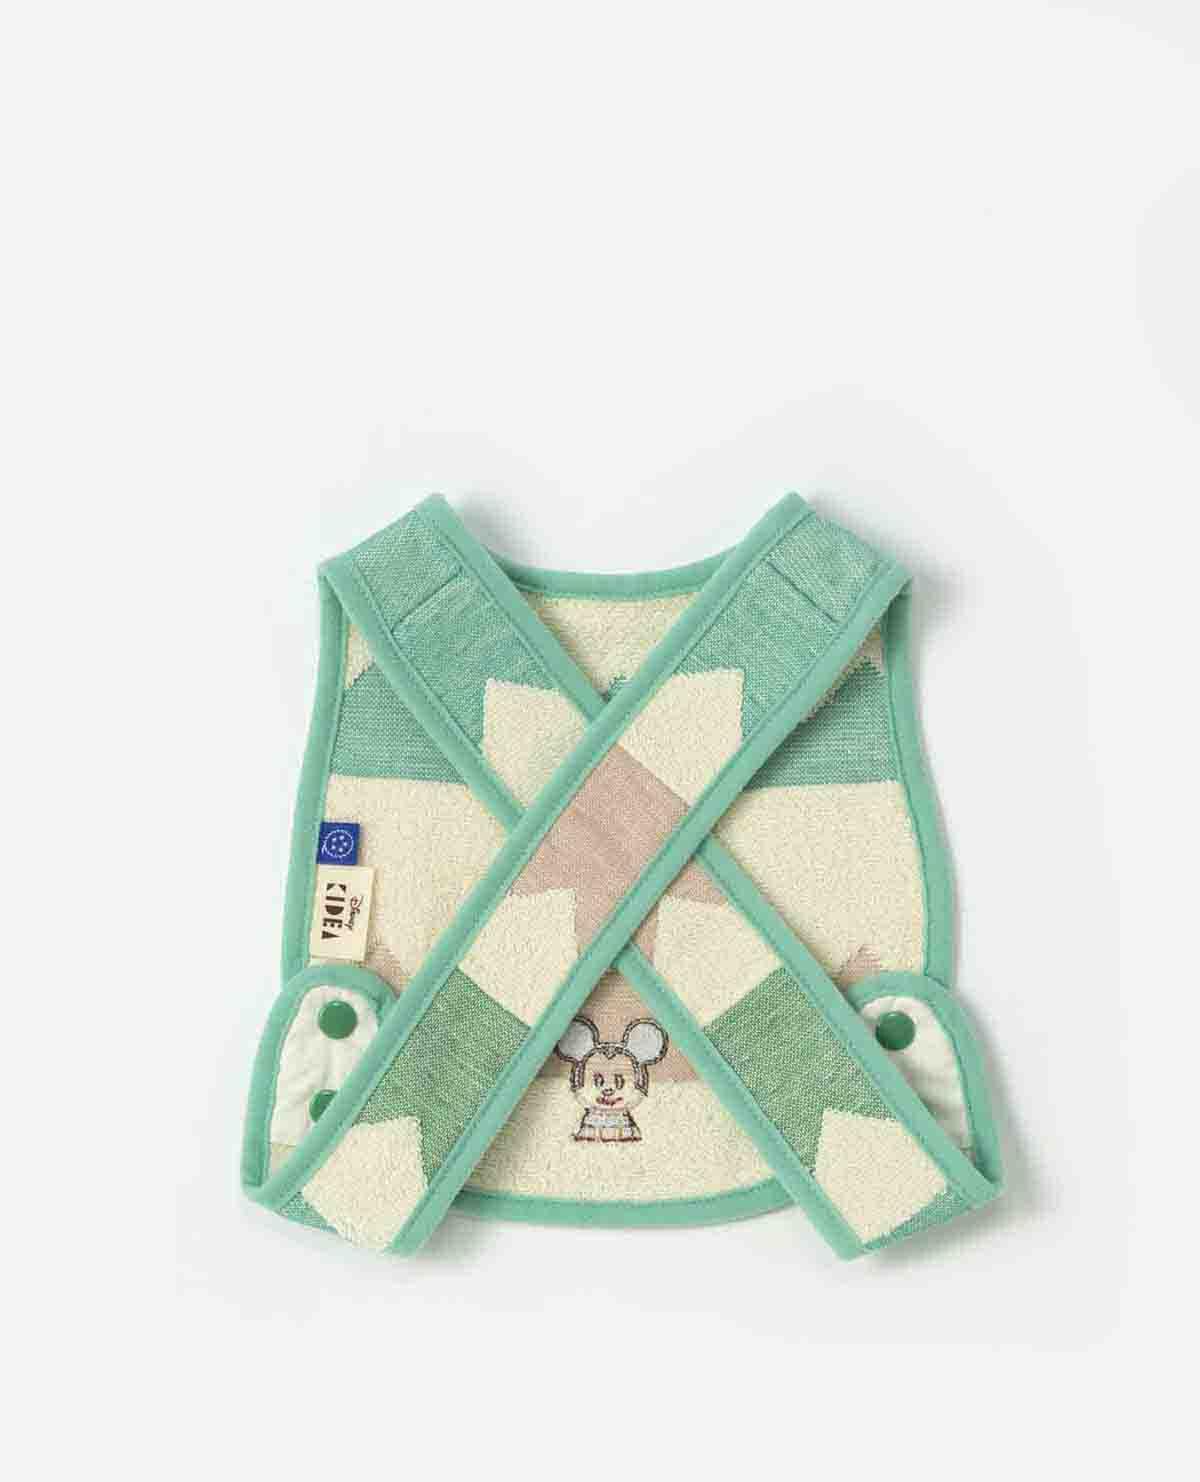 ZIGUZAGU タオルセット(フェイスタオル・スタイ・巾着) ミッキーマウス